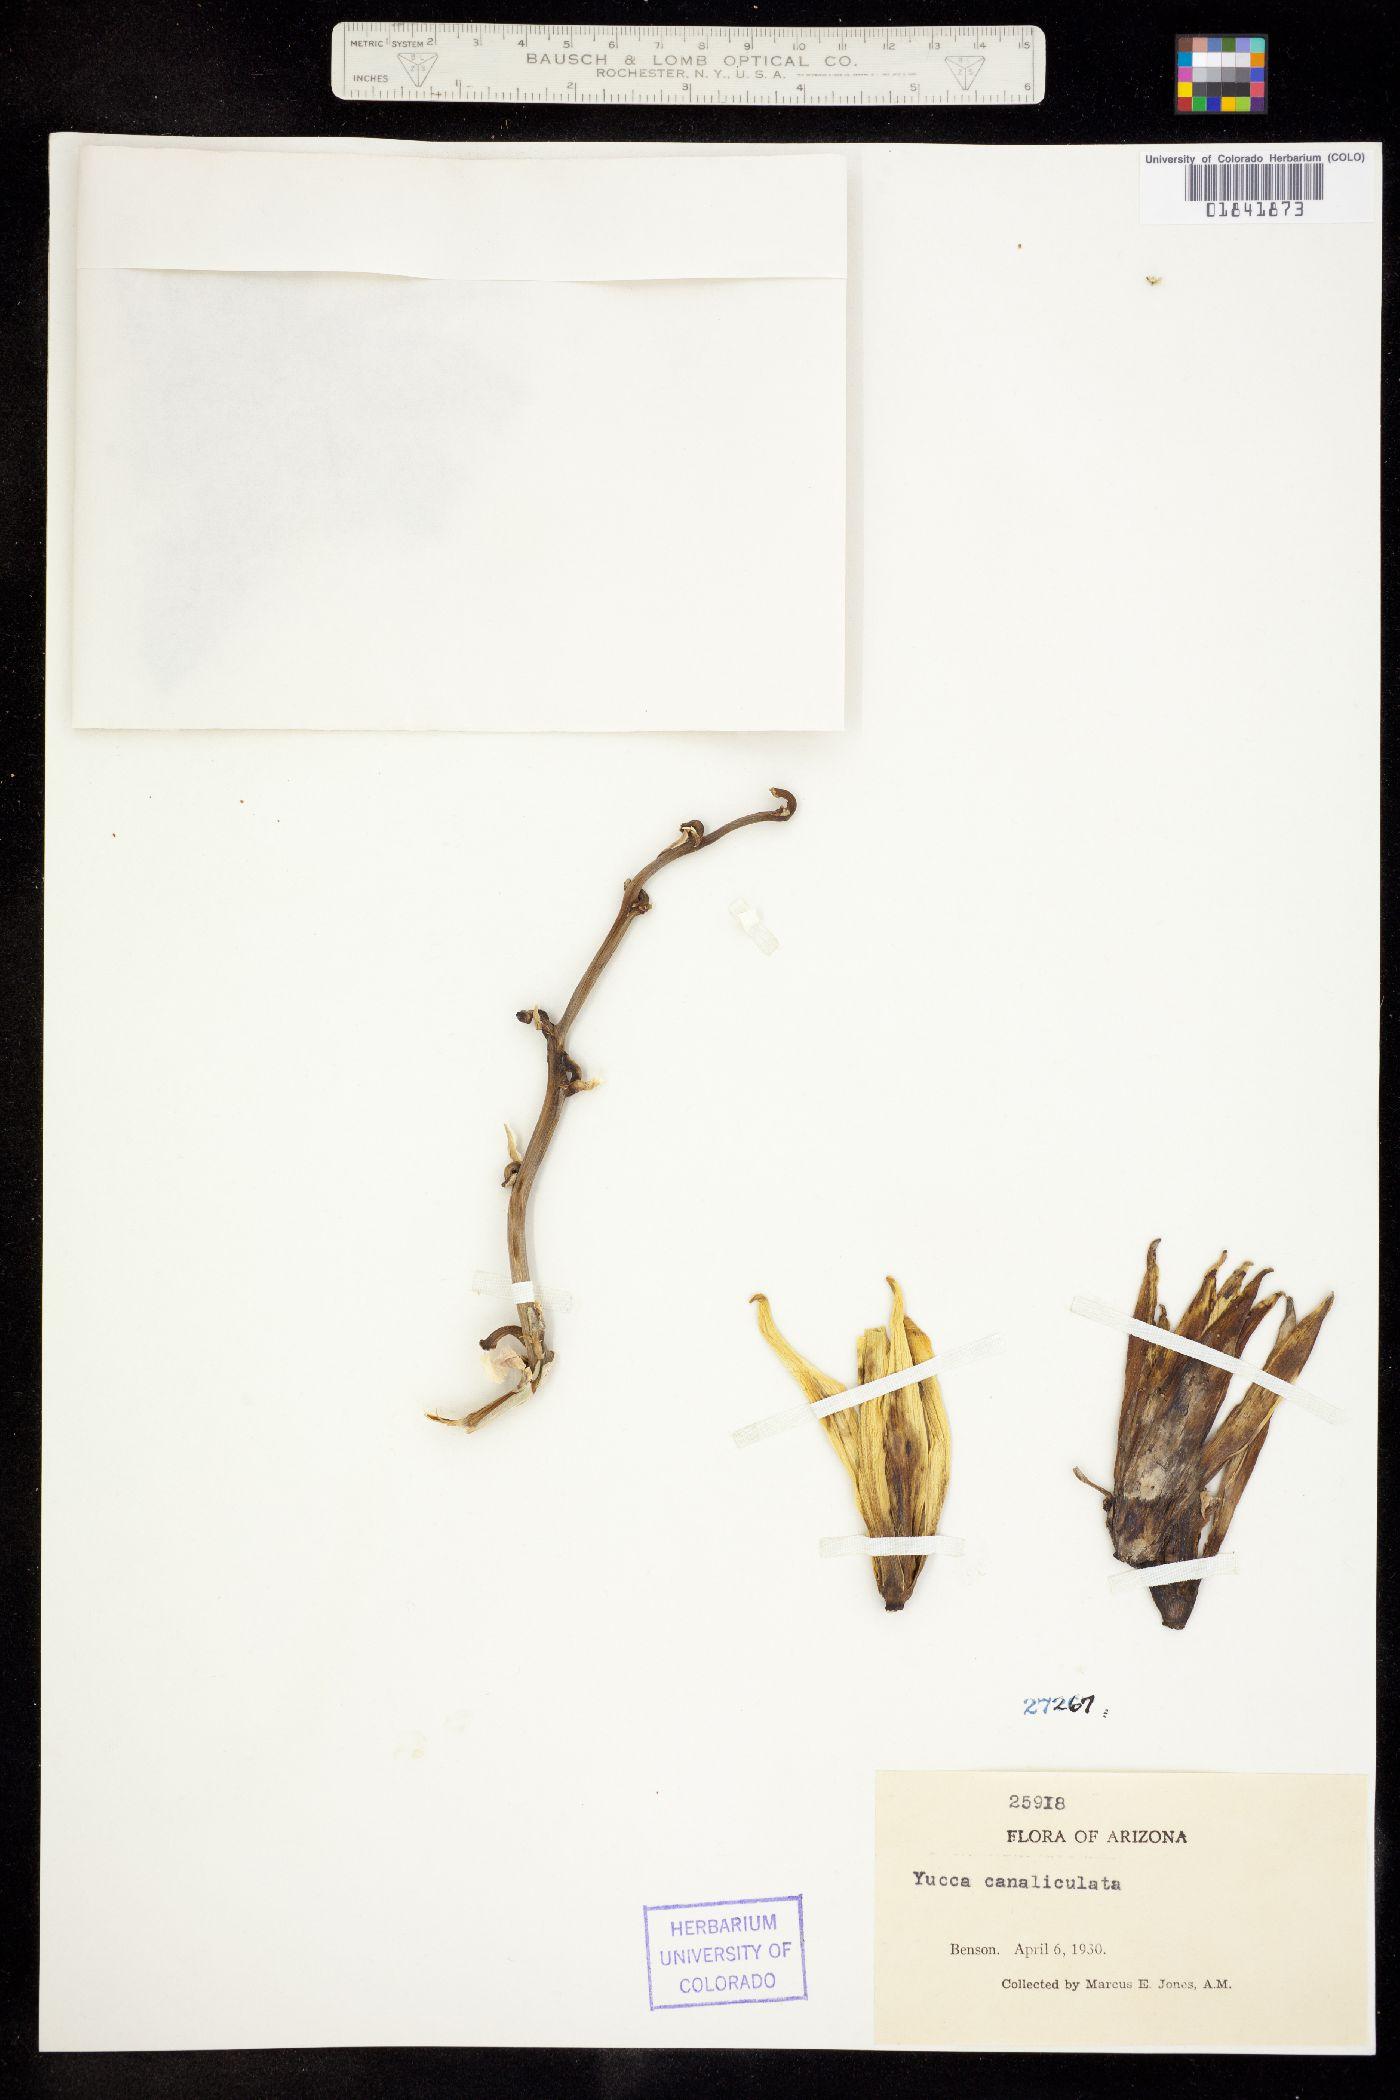 Yucca canaliculata image